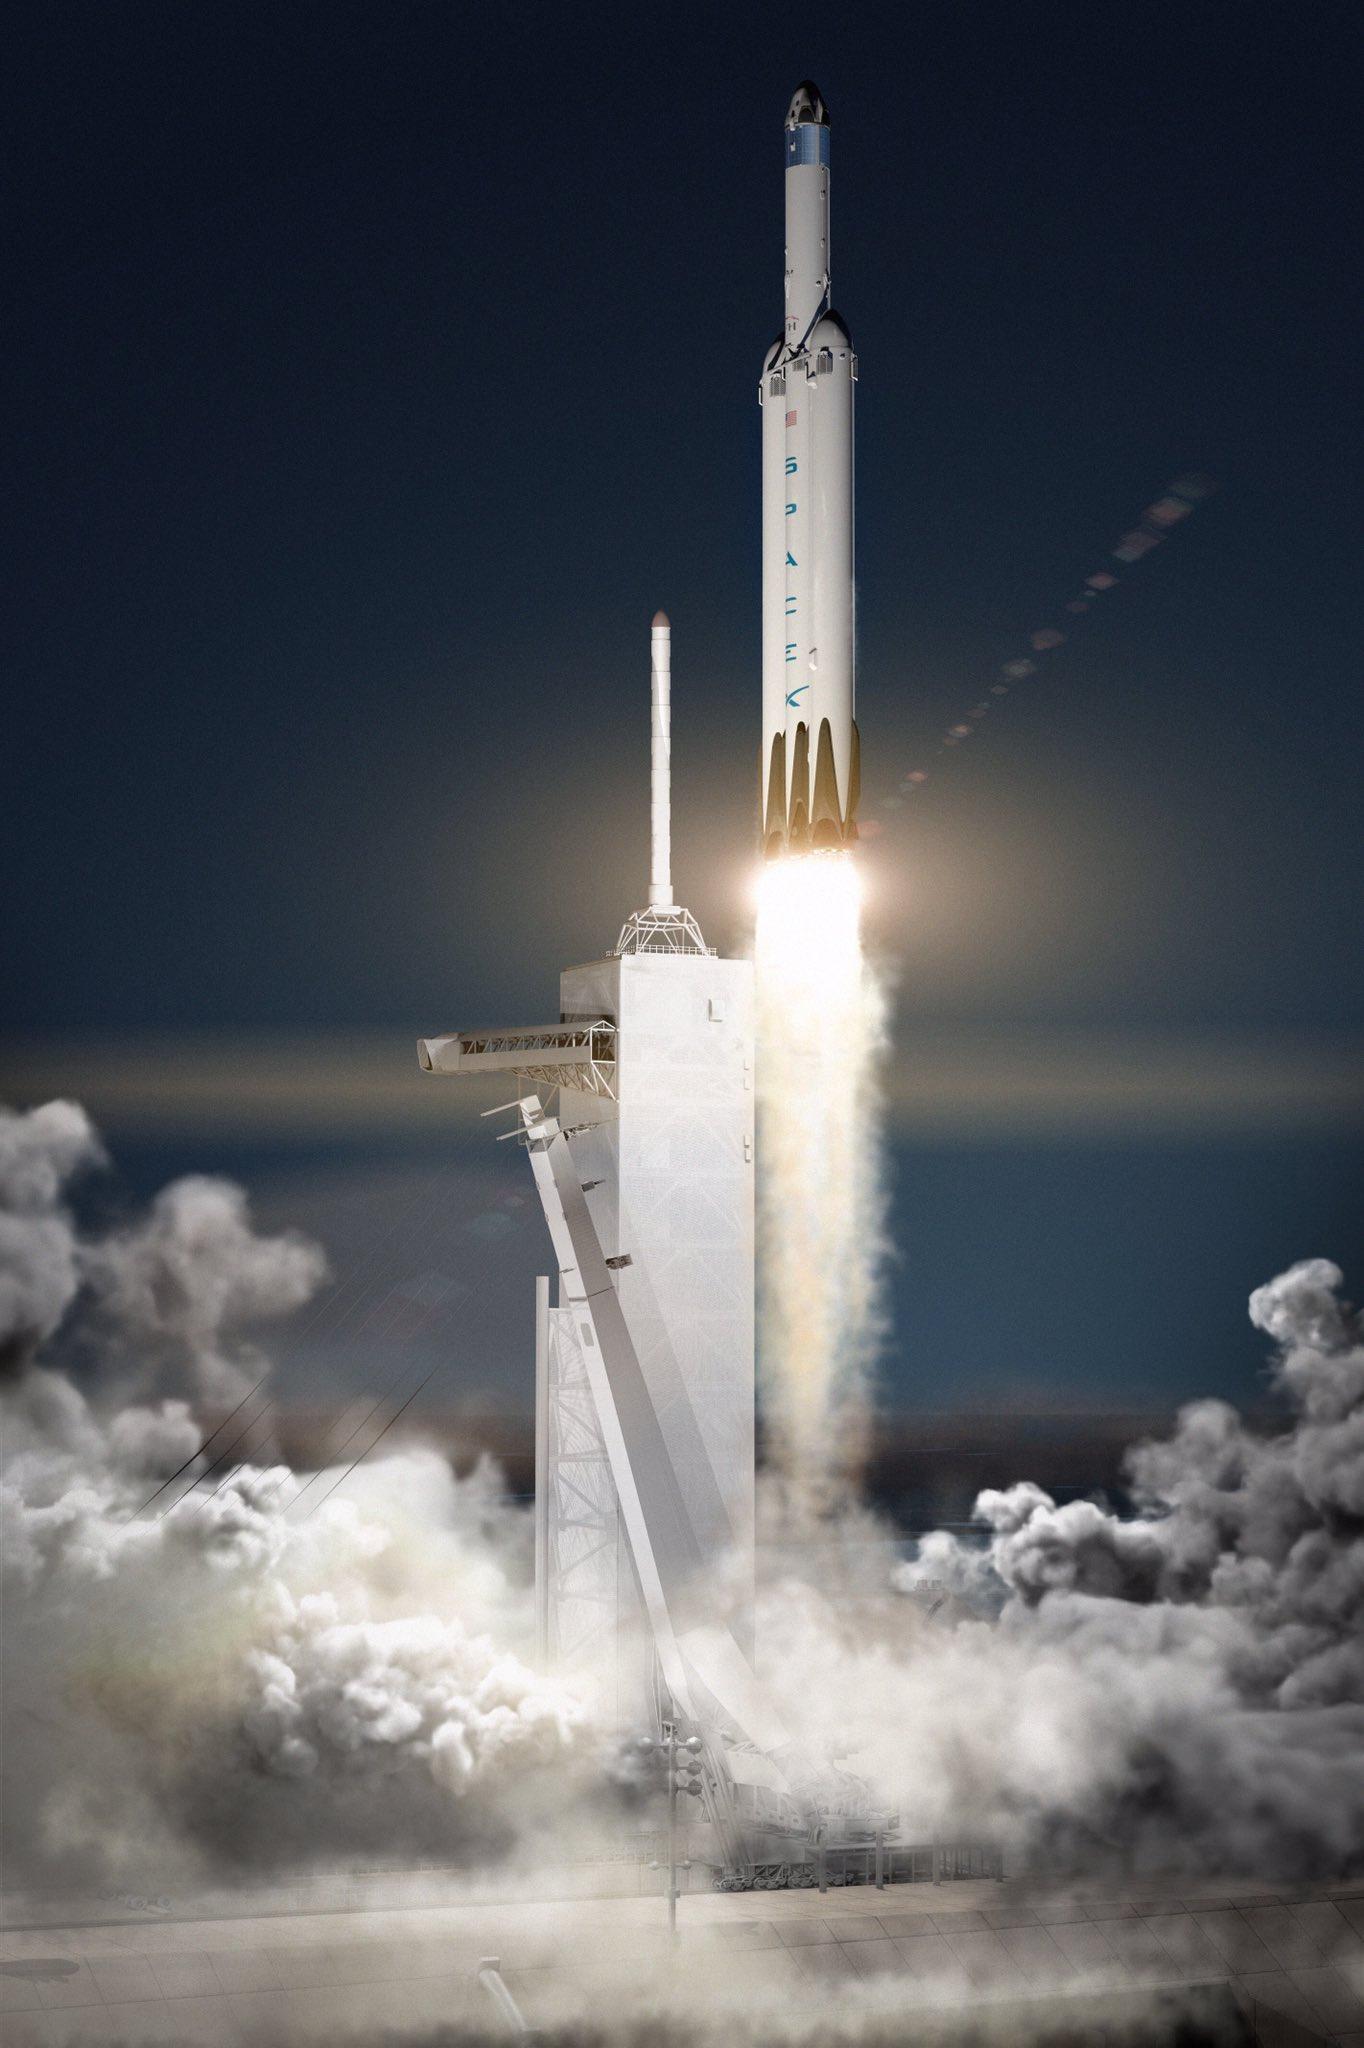 spacex dragon capsule status - photo #33